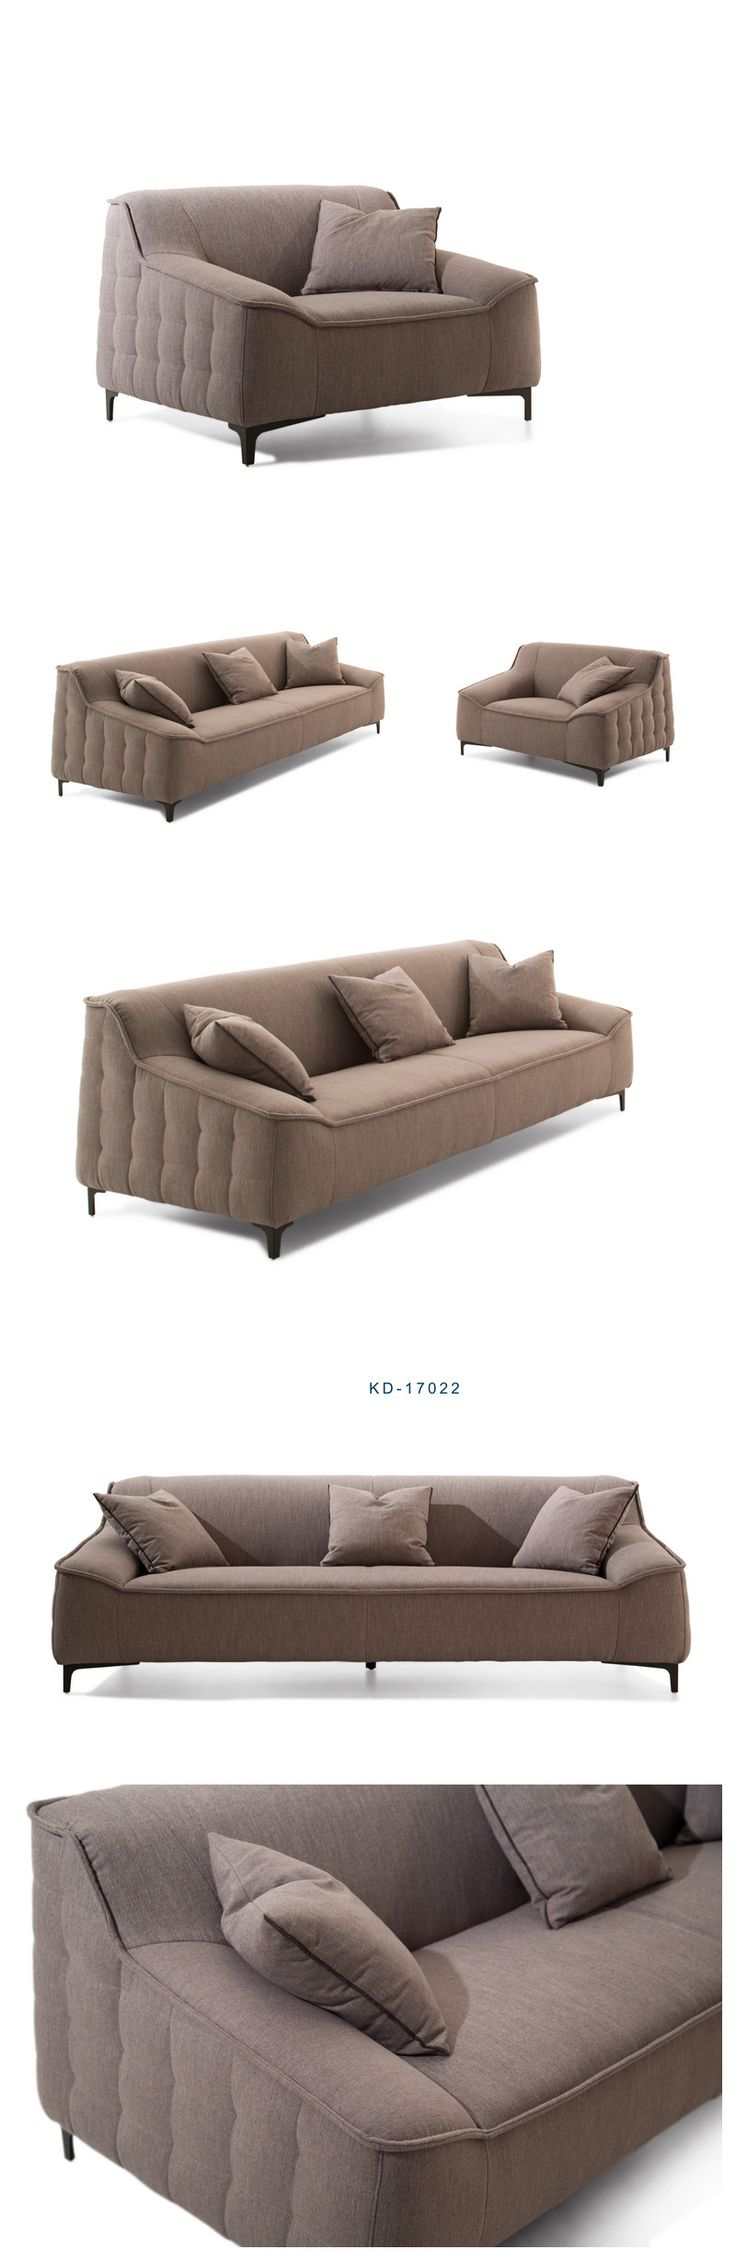 new design modern sofa set #sofaset #sofa #cocheen #modernsofa #cocheendesign #livingroomsofa #furniture #newdesign #sectionalsofa #homefurniture #couch #furniturefactory  contact:jennifer@cocheen.com  online store link: cocheenfurniture.en.alibaba.com